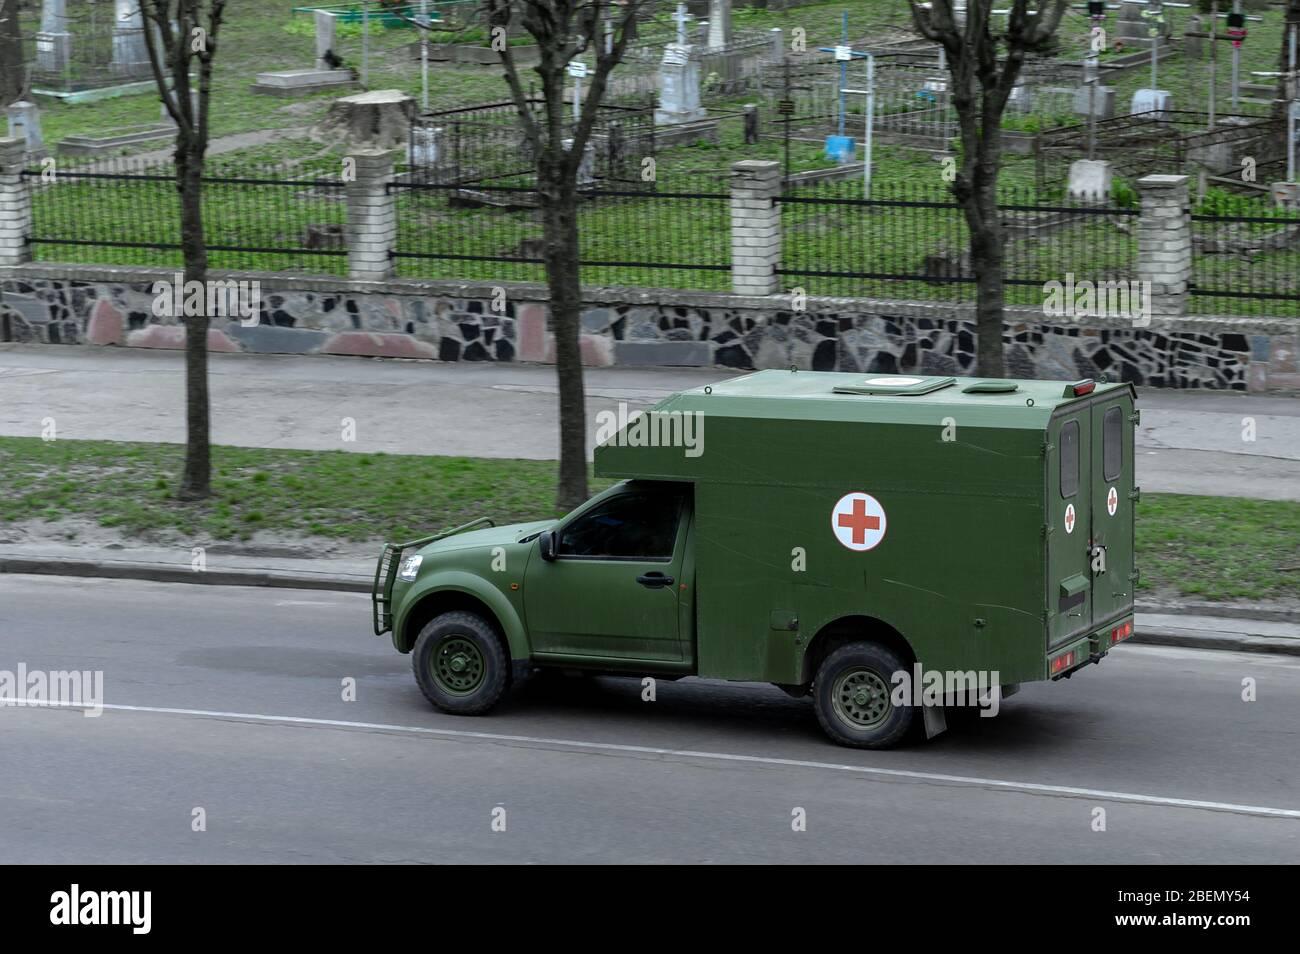 RIVNE, UKRAINE - APRIL 14, 2020. Mmilitary ambulance in the city Stock Photo